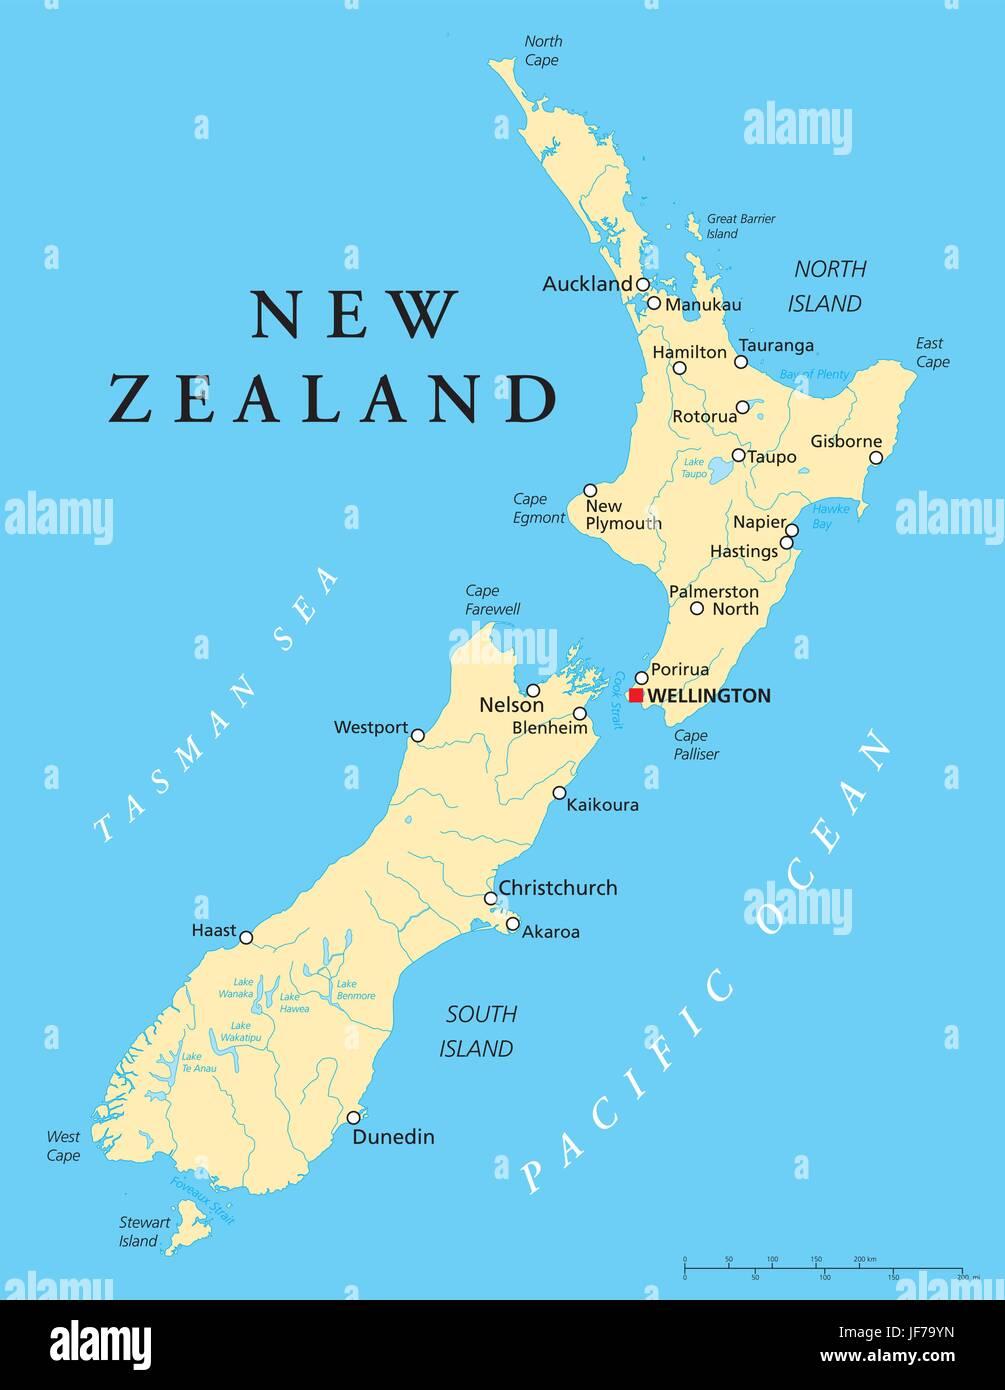 Nuova Zelanda Cartina Mondo.Nuova Zelanda Mappa Atlas Mappa Del Mondo Politico Nuovo